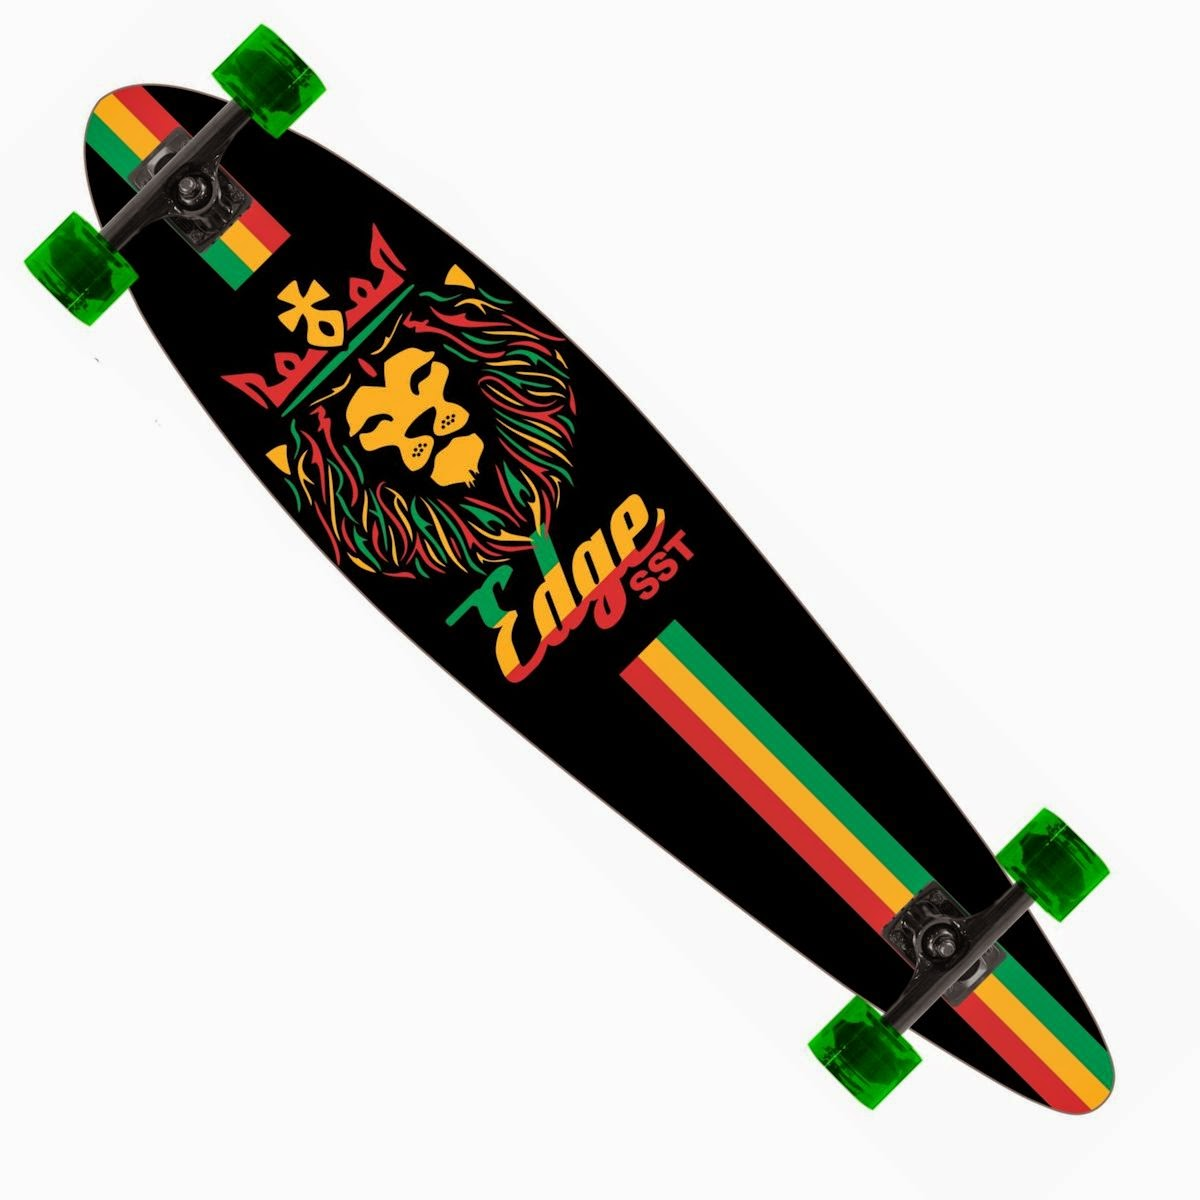 King Rasta Longboard Pintail Complete 9.25″ x 39.25″